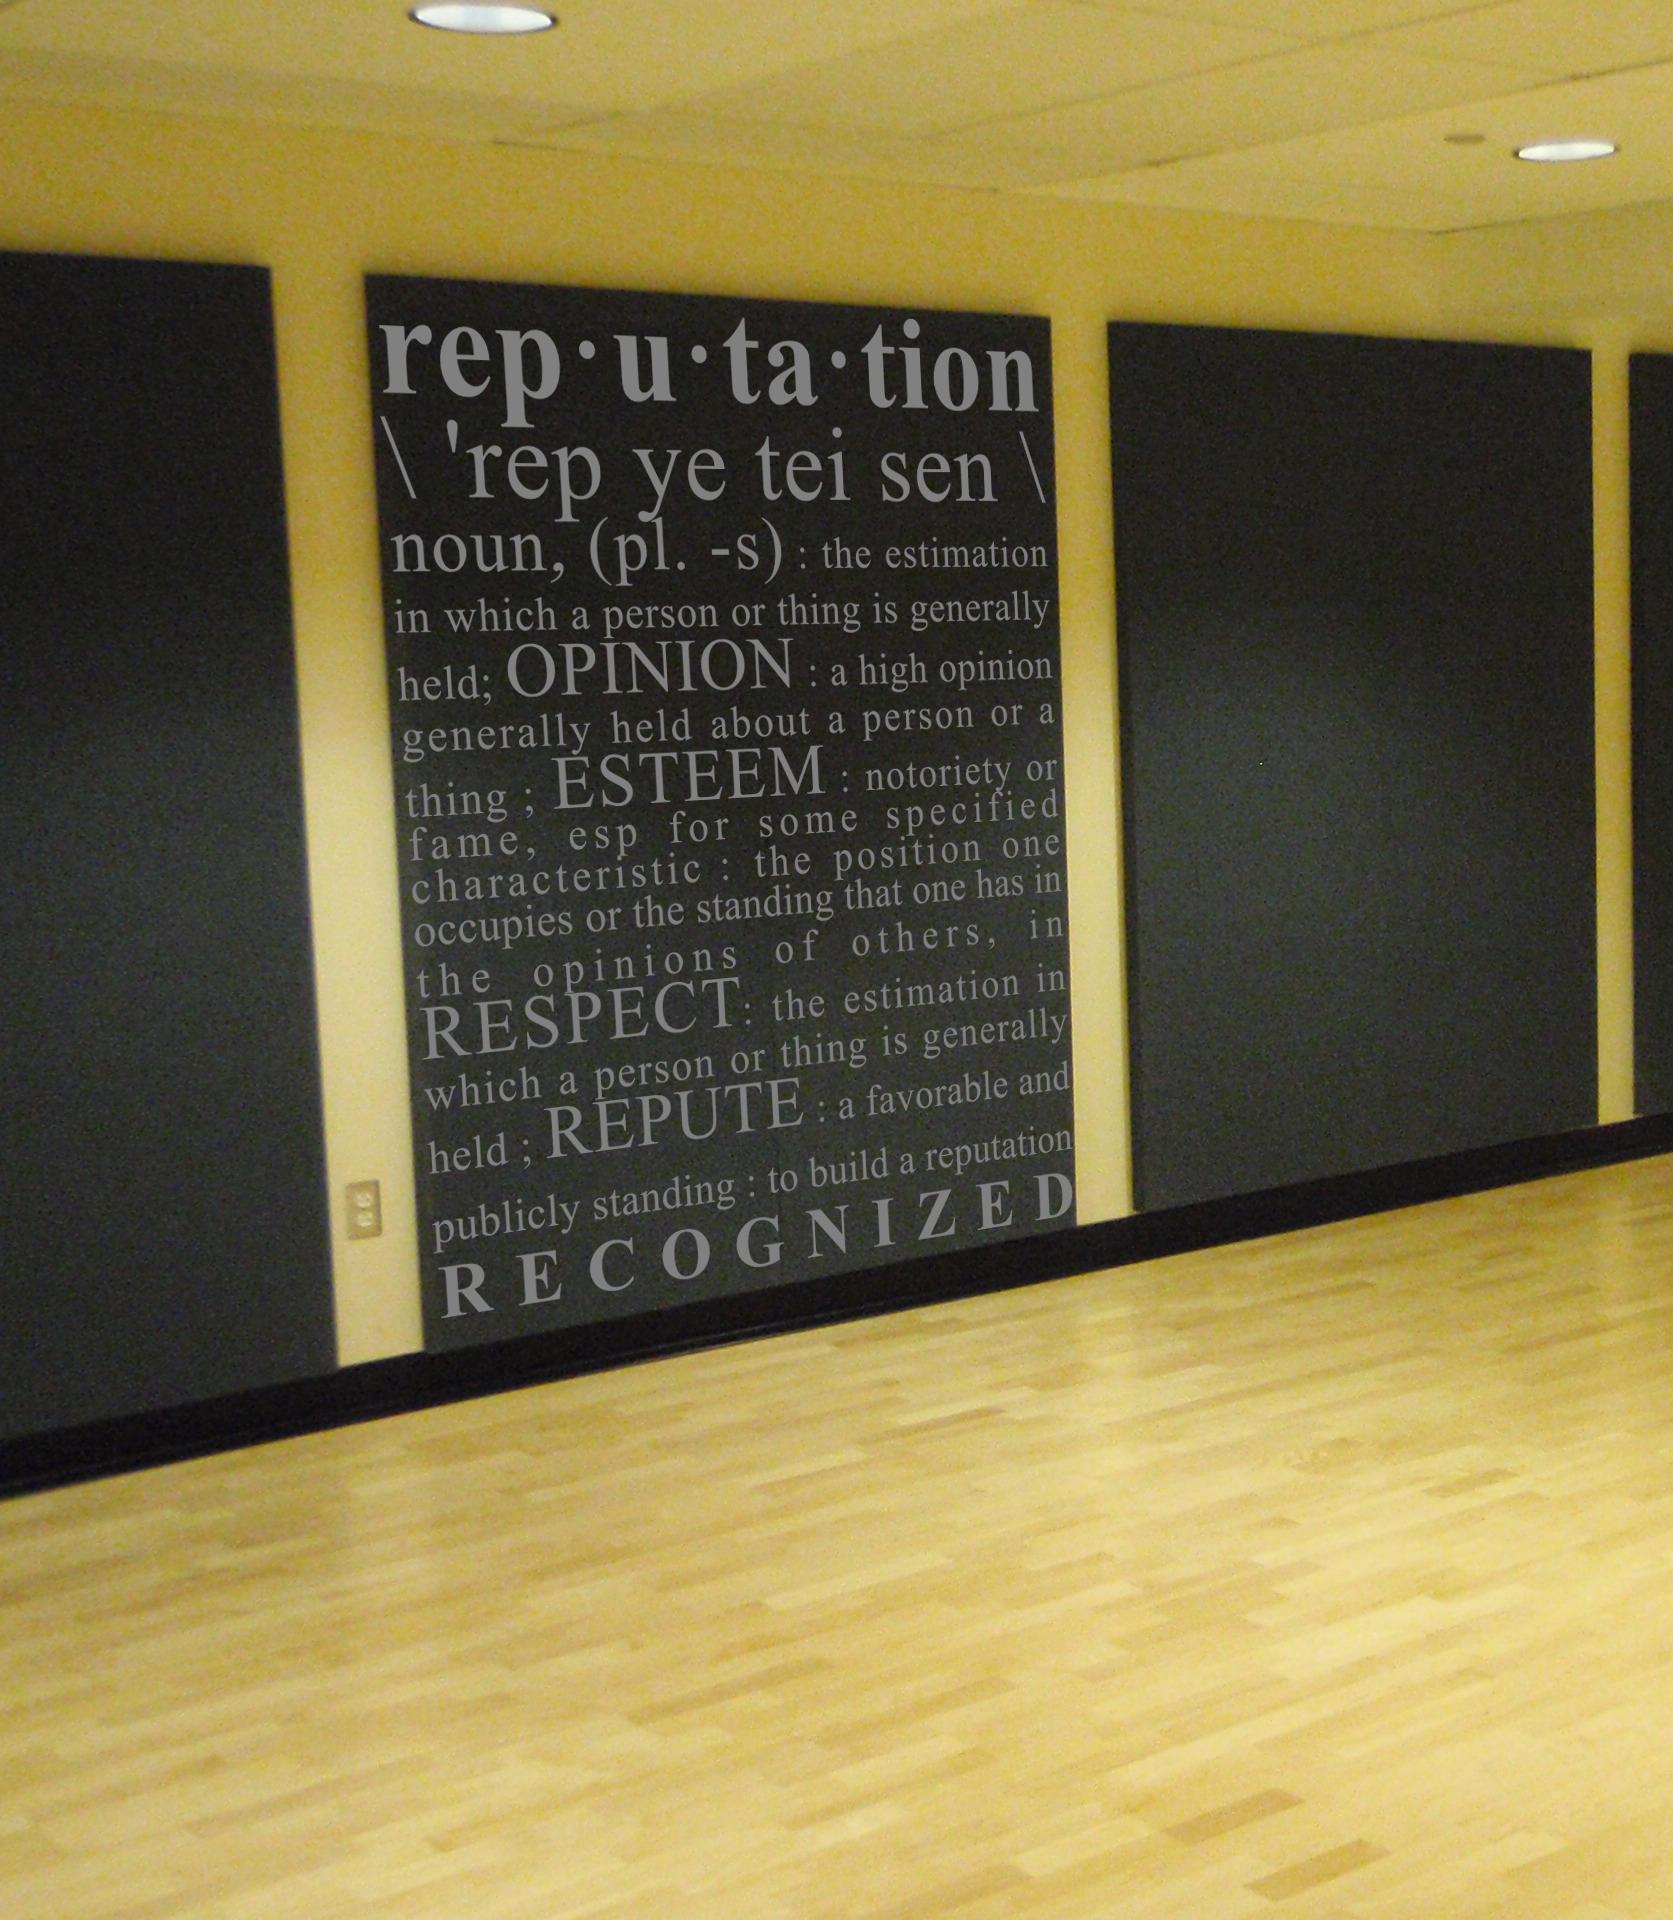 Reputation Definition Wall Decal